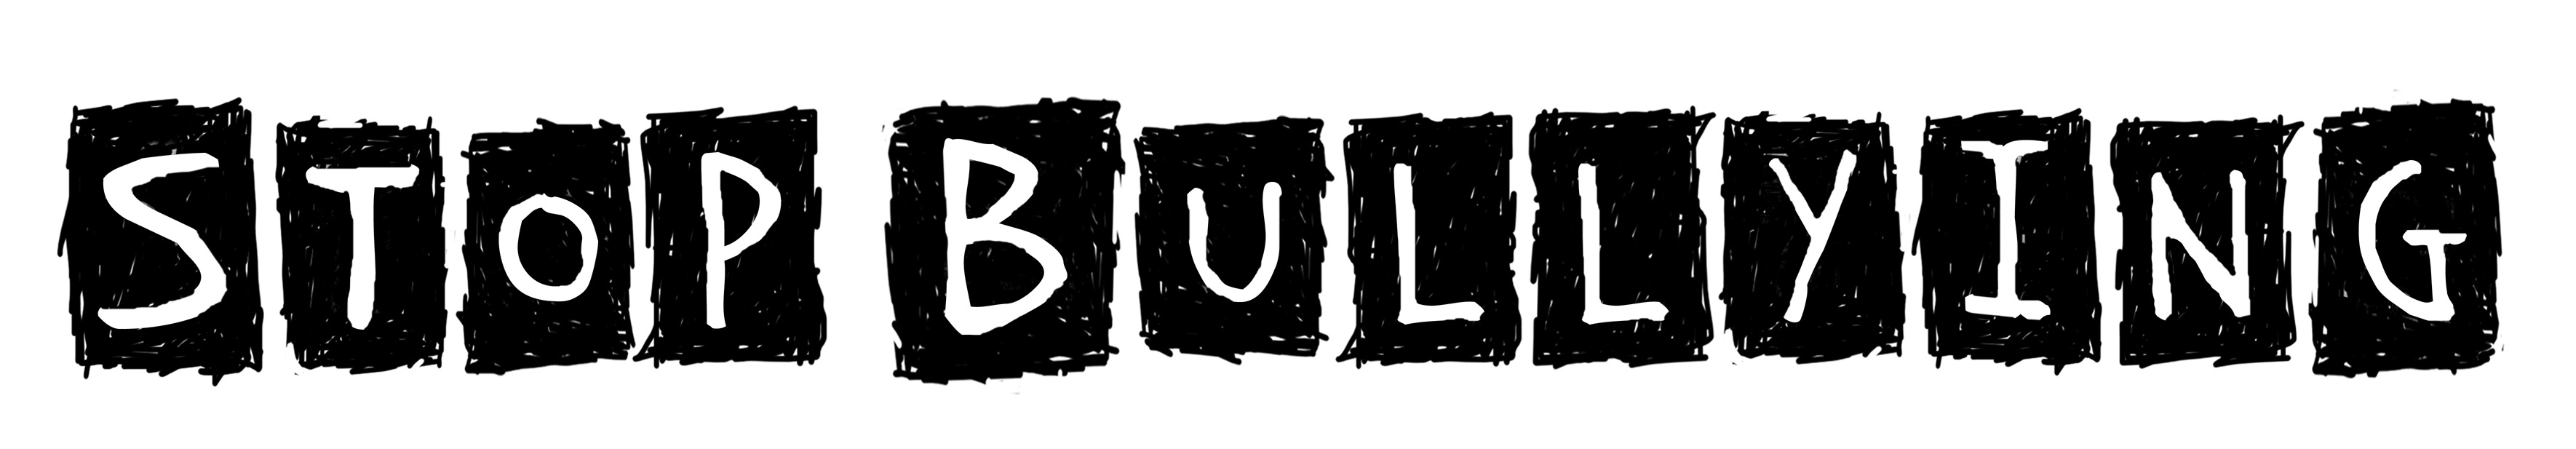 Bullying clipart word. Anti brakpan herald